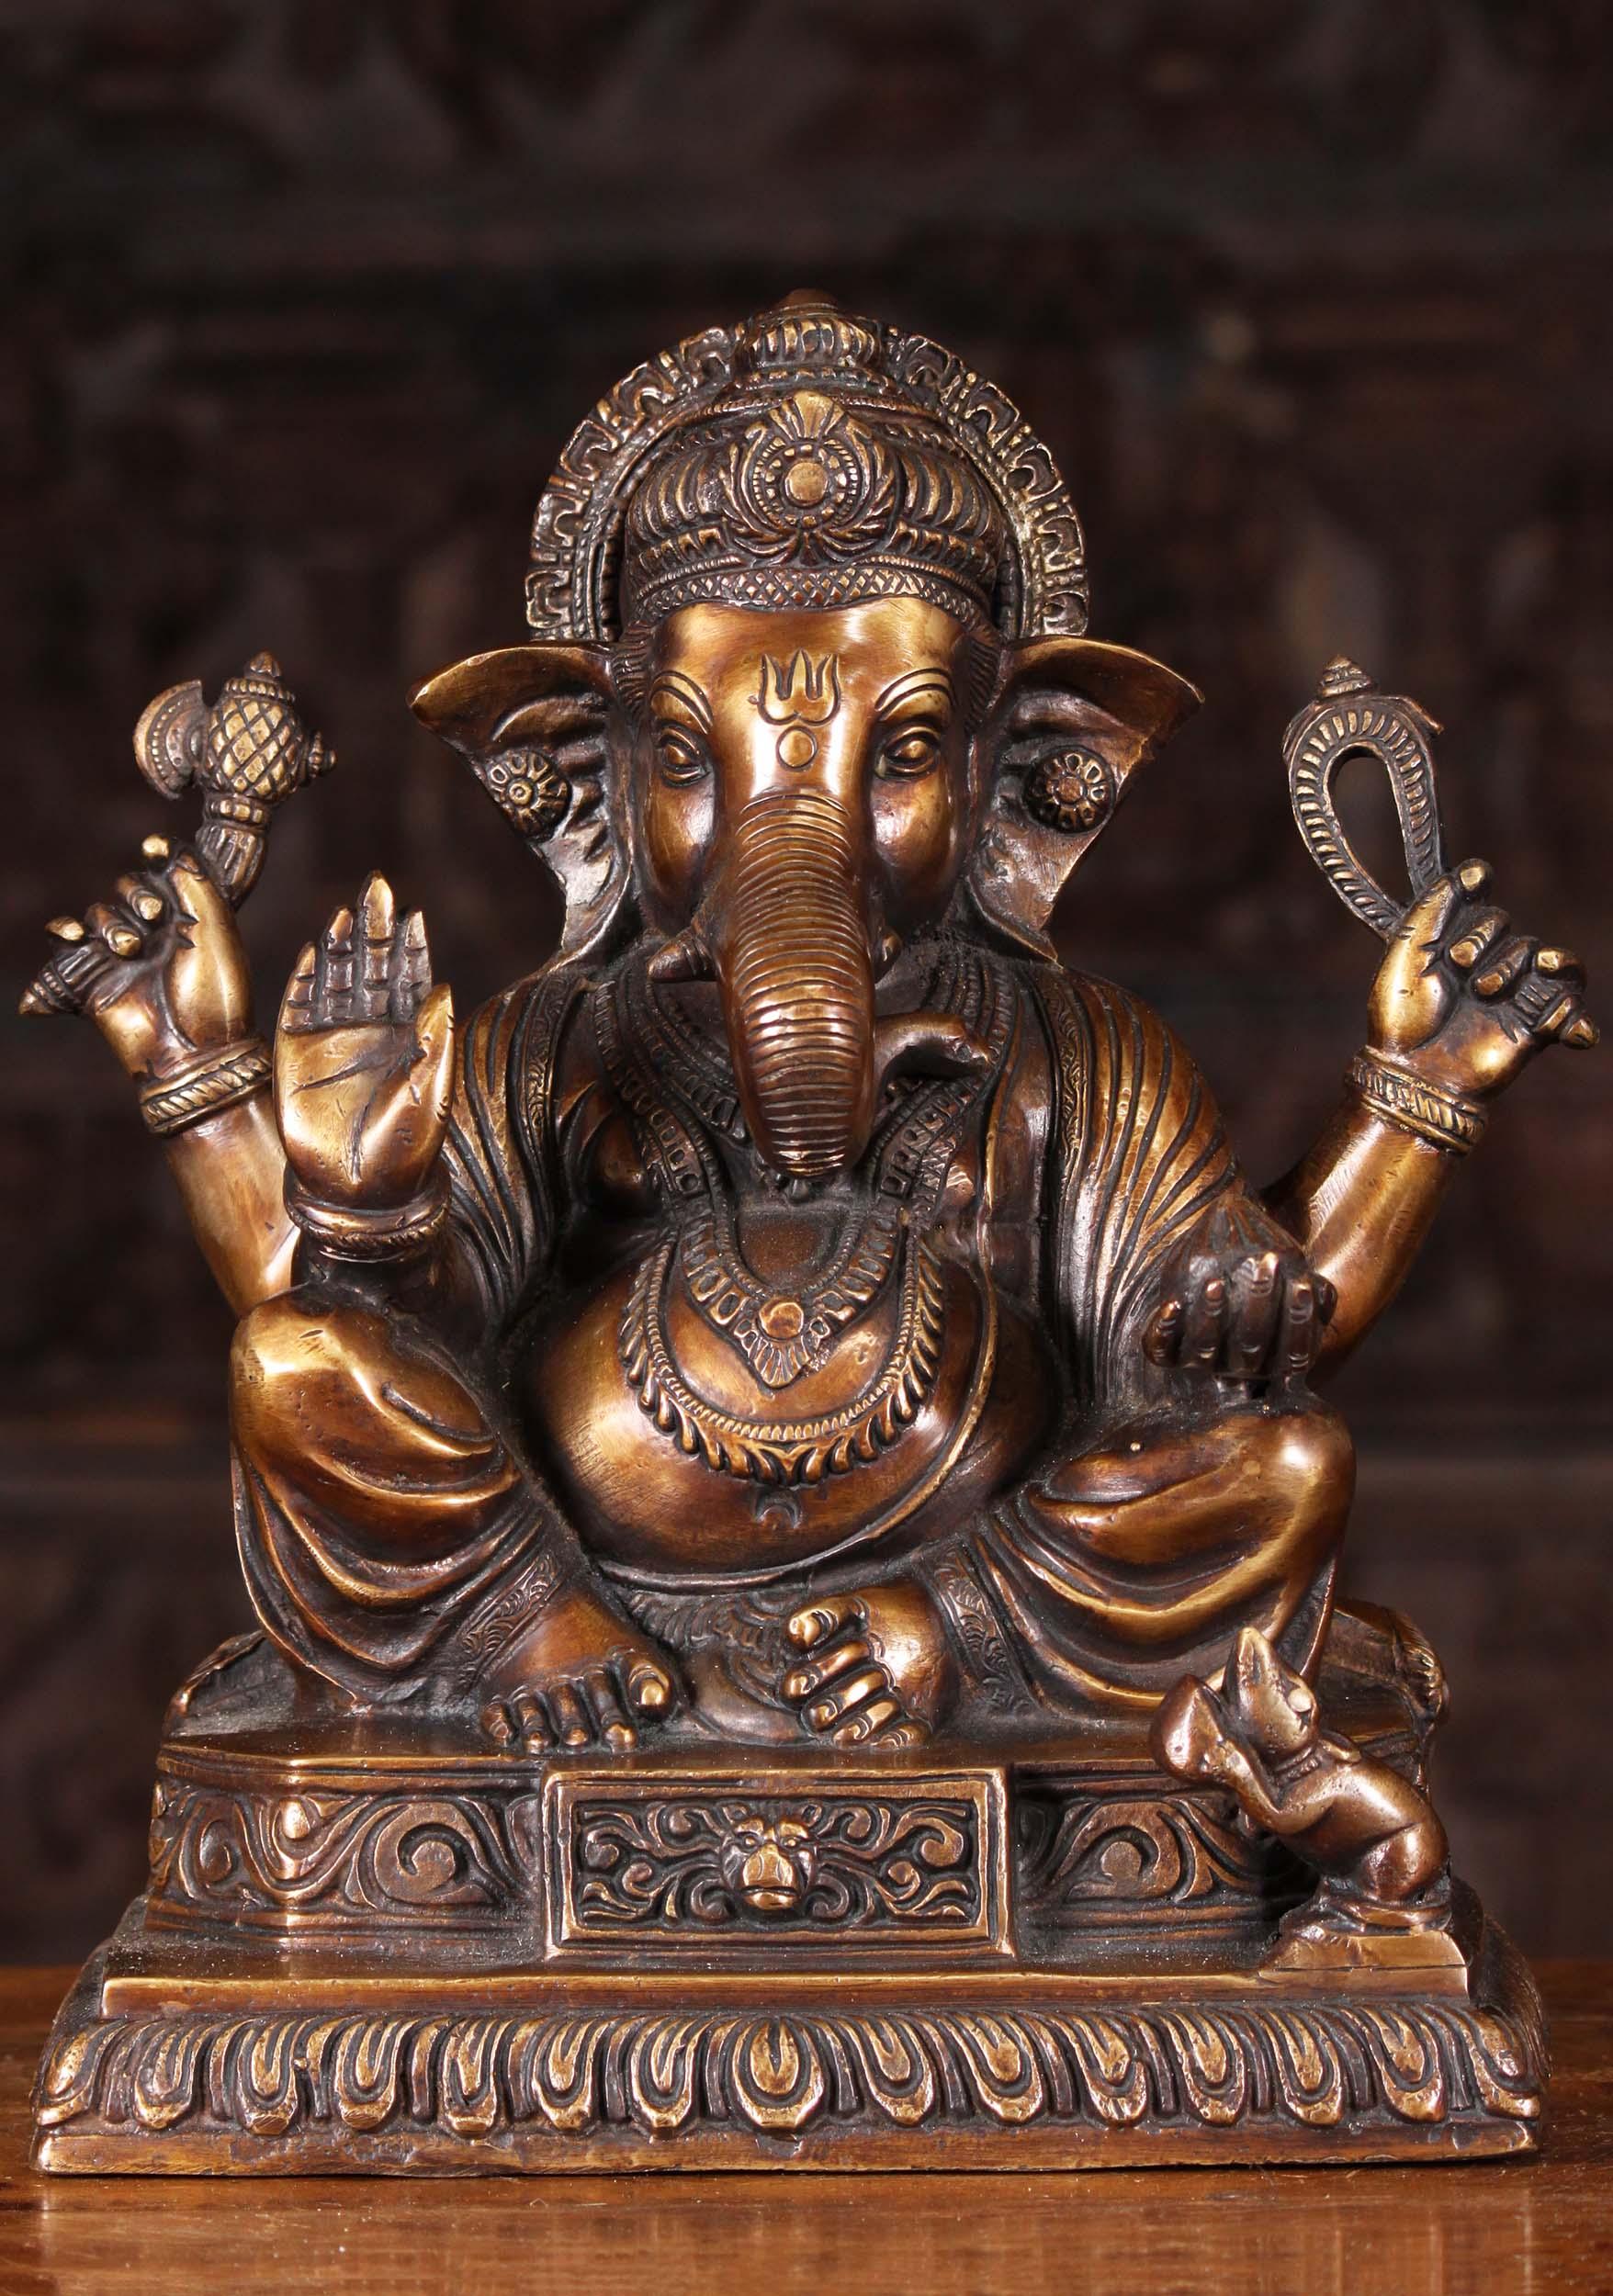 Brass Seated Abhaya Ganesha Statue 12 61bs2z Hindu Gods Buddha Statues